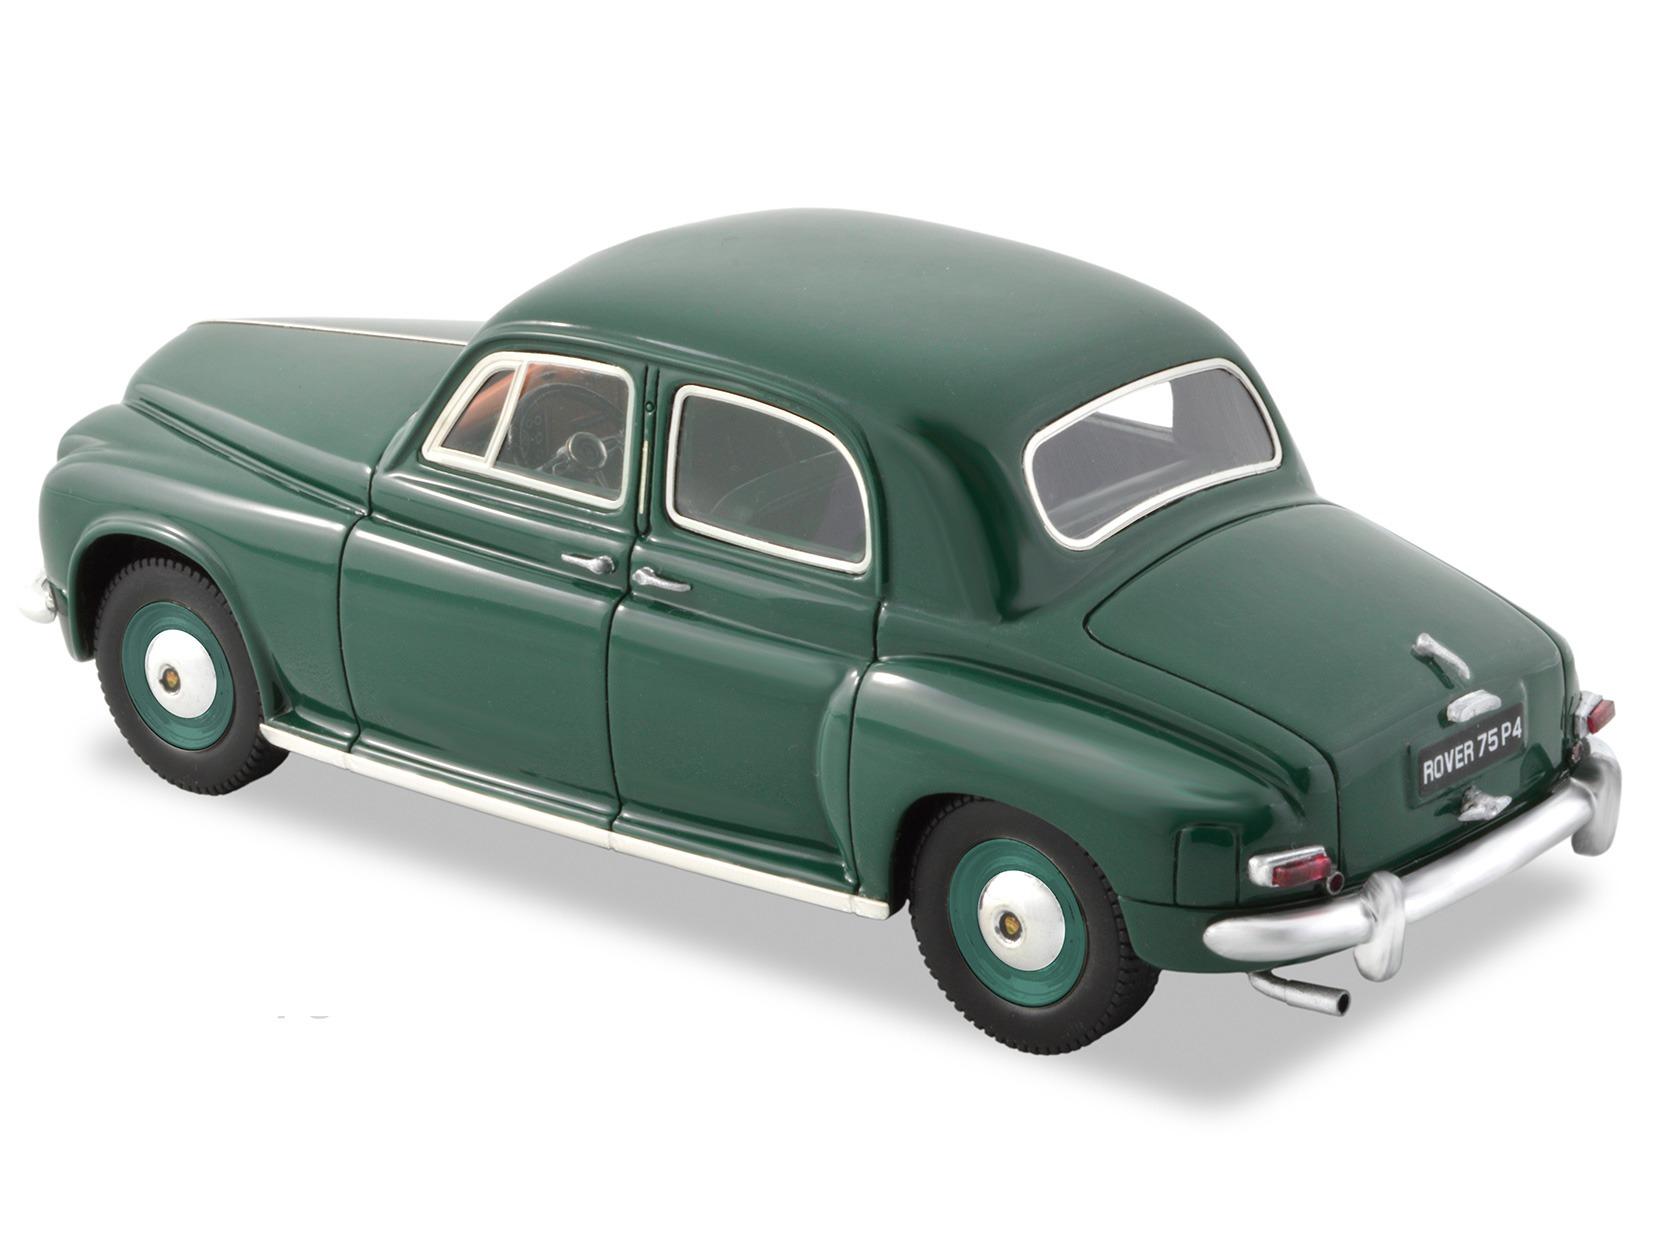 1952 Rover 75 P4 – LHD – British Racing Green